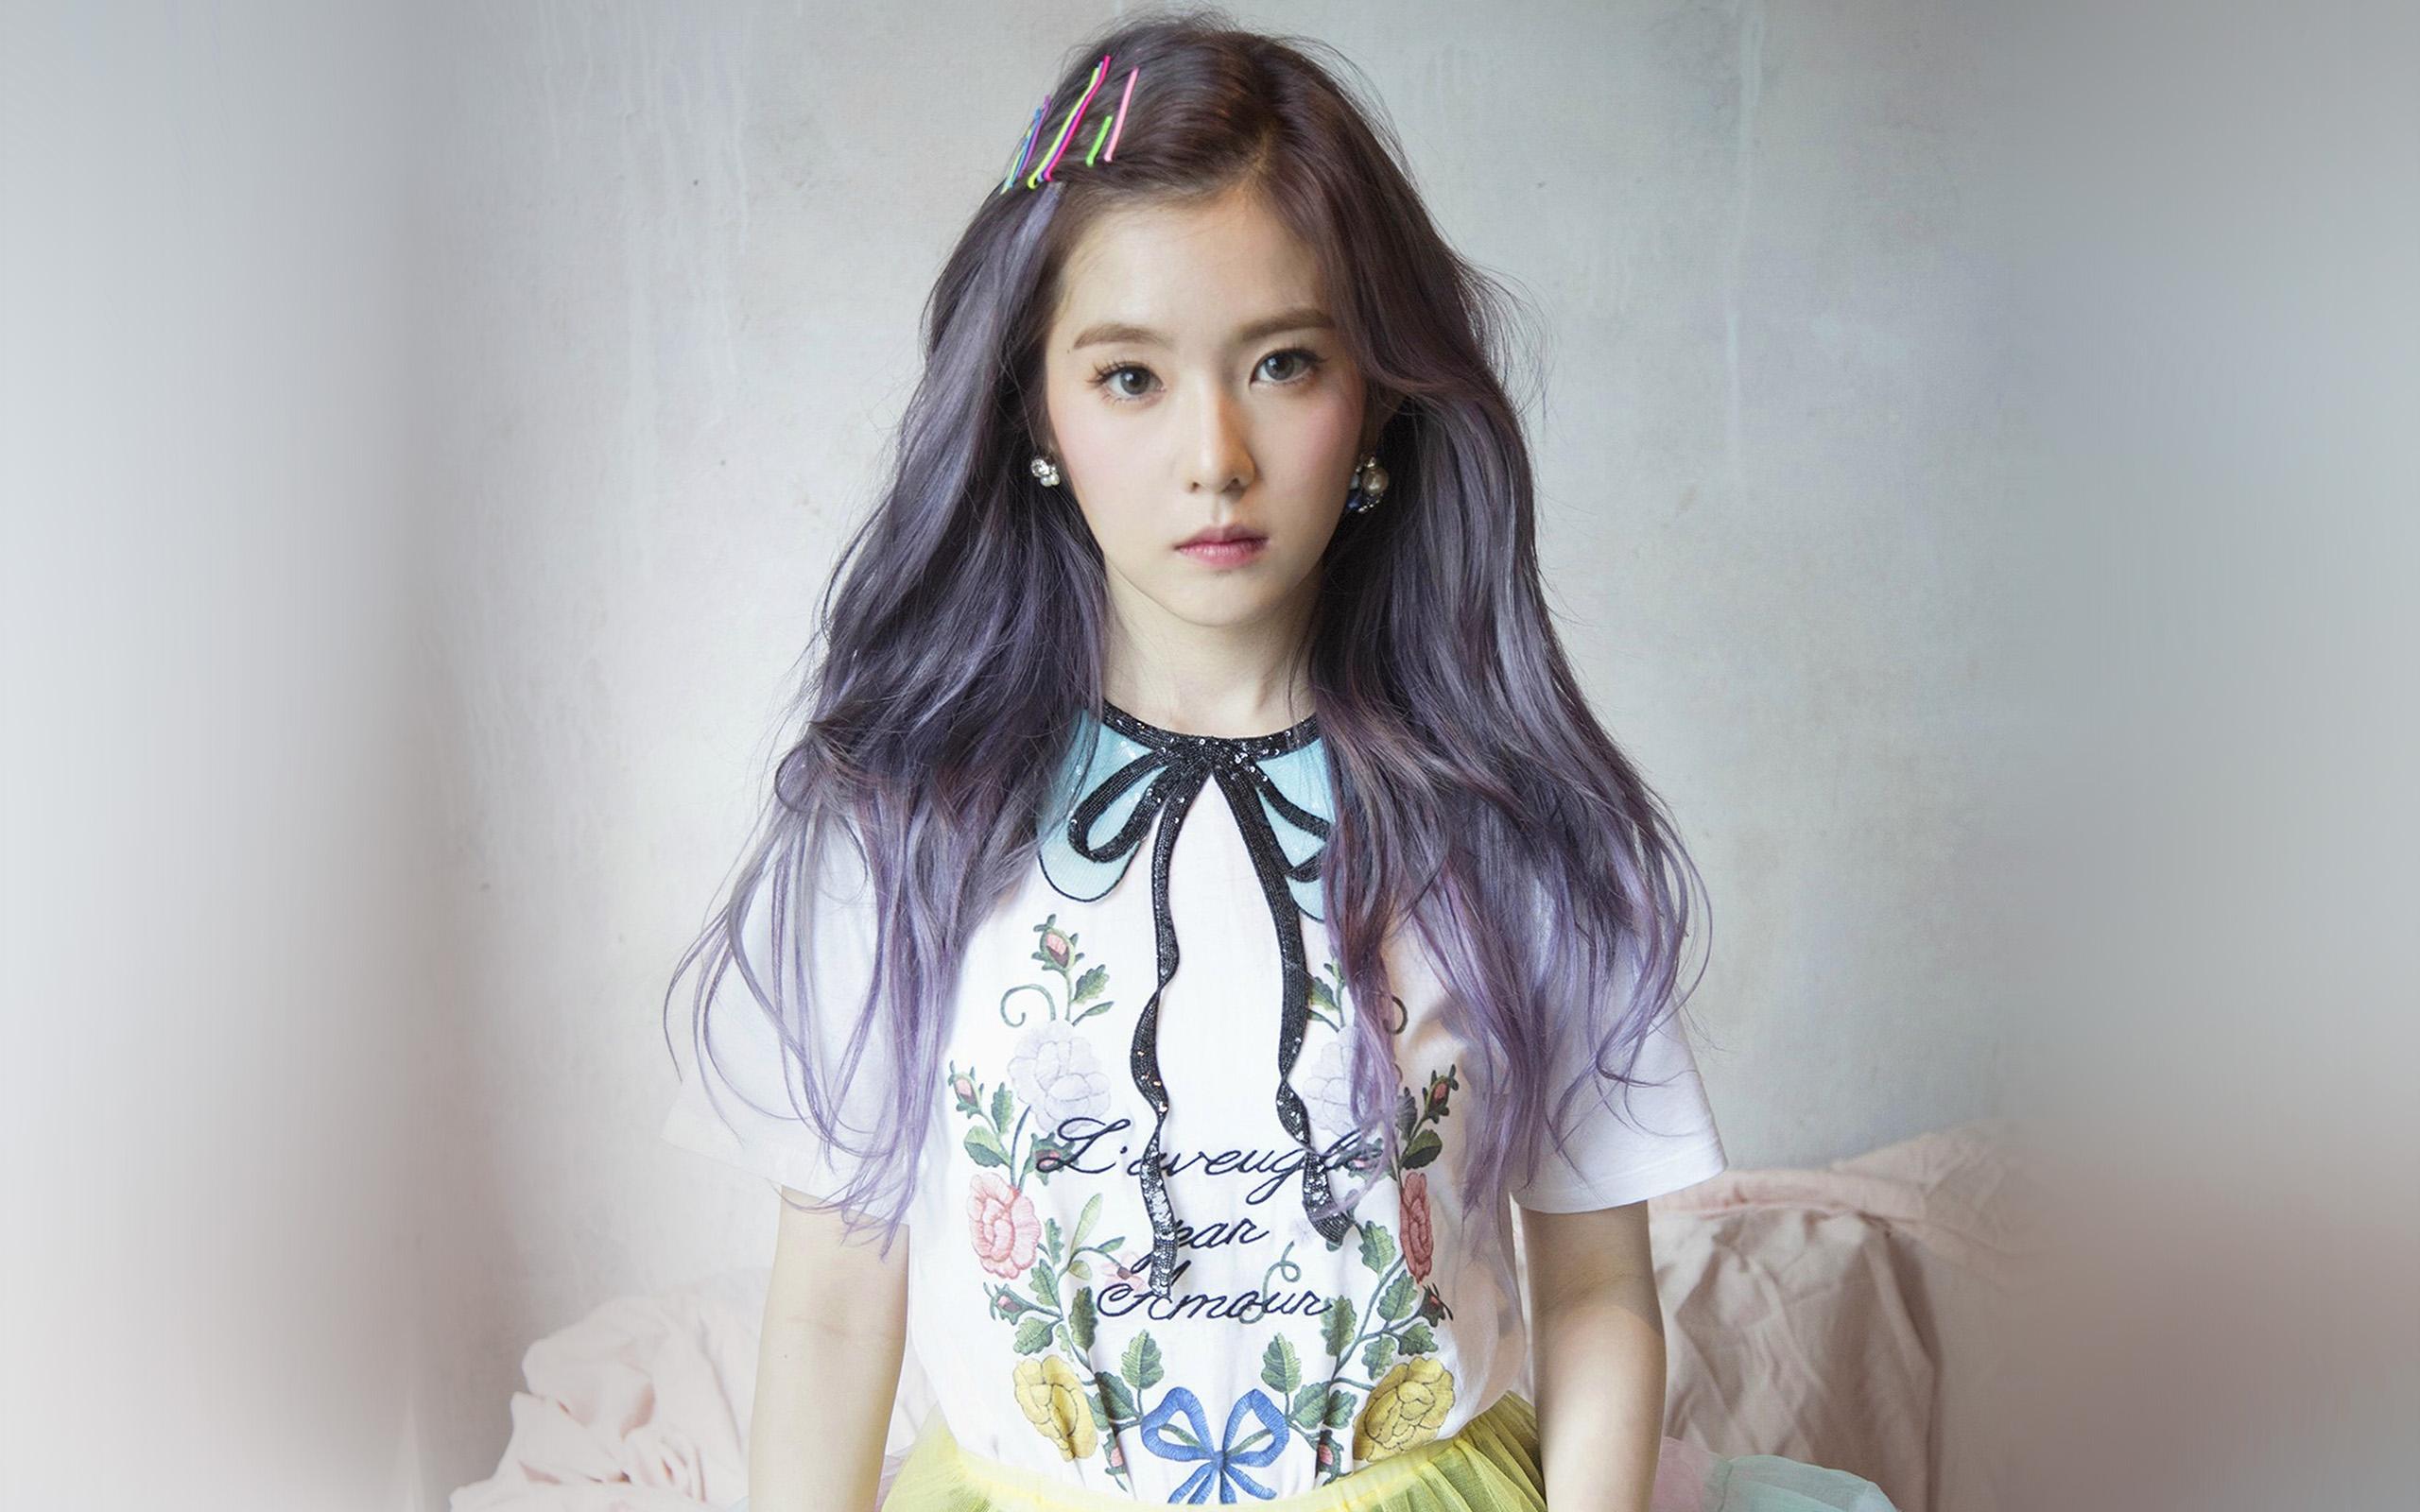 Cute Butterfly Wallpaper Desktop Hp02 Girl Redvelvet Kpop Doll Wallpaper